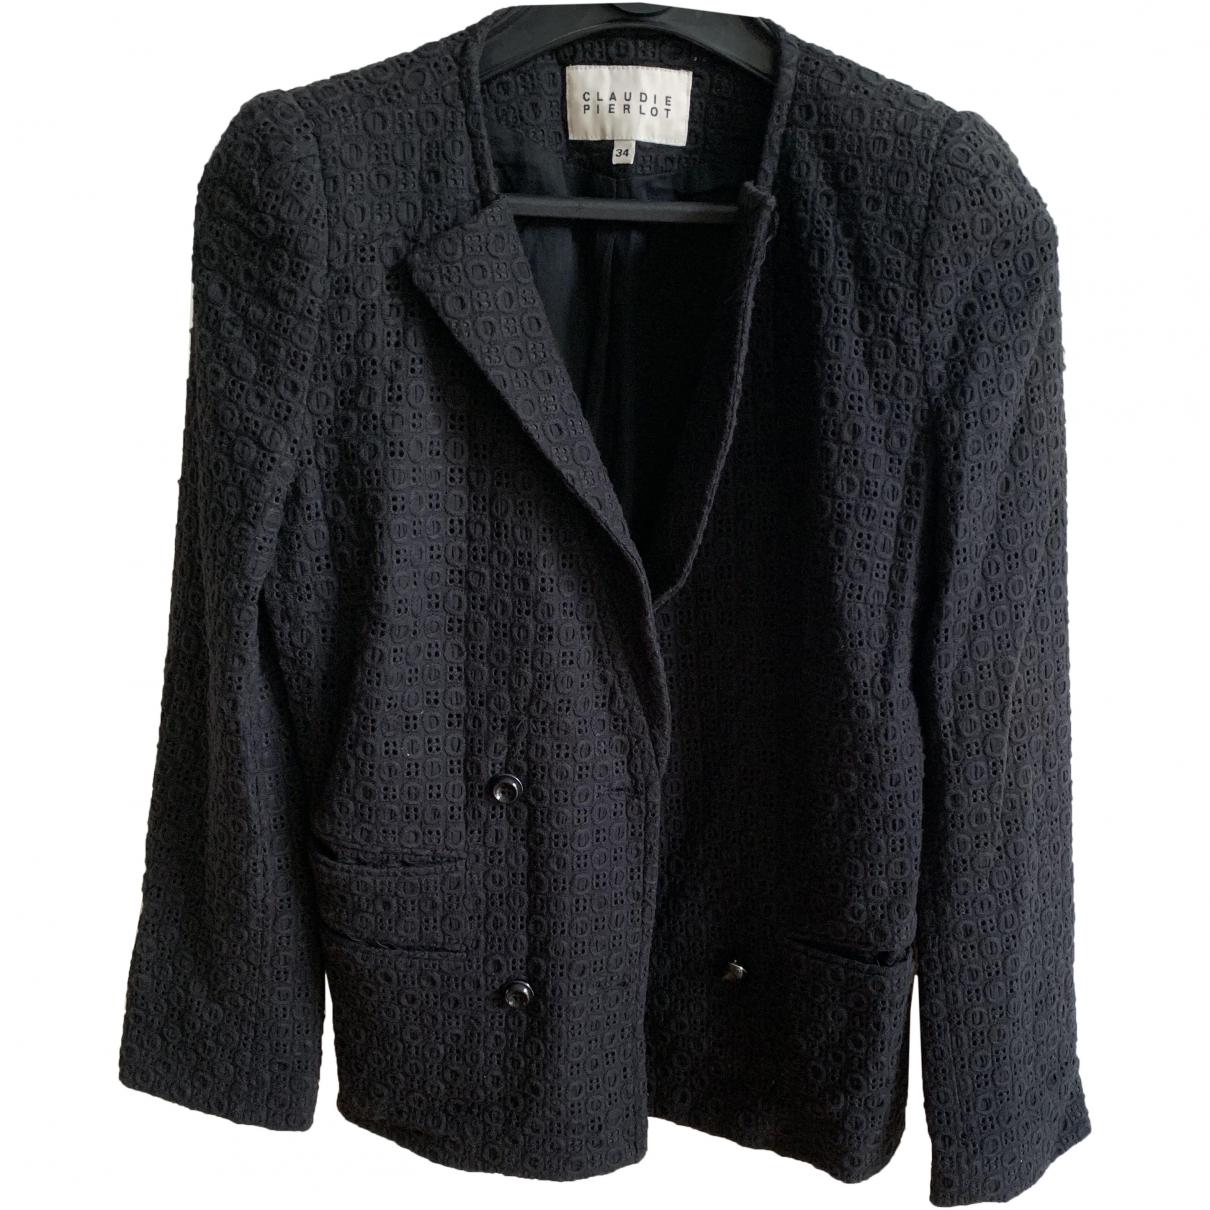 Claudie Pierlot \N Black Cotton jacket for Women 34 FR